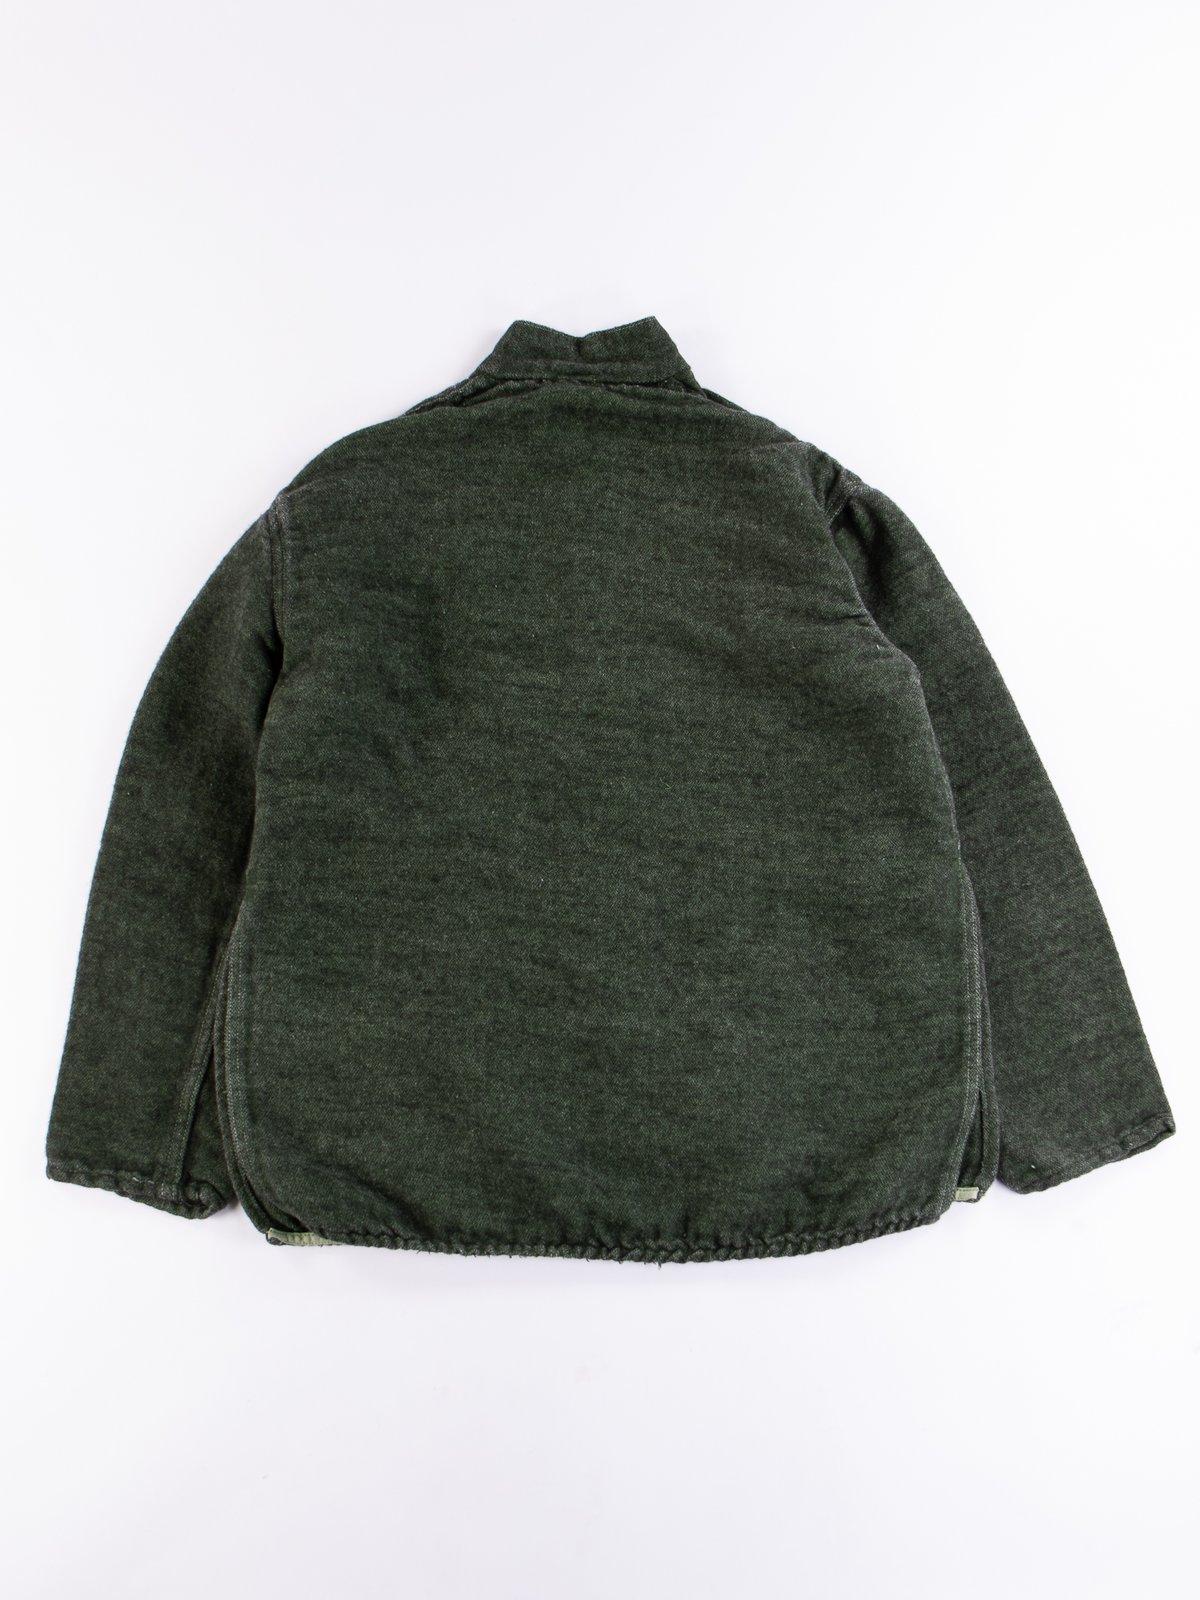 Viridian/Black Cotton/Mohair Janus Jacket - Image 6